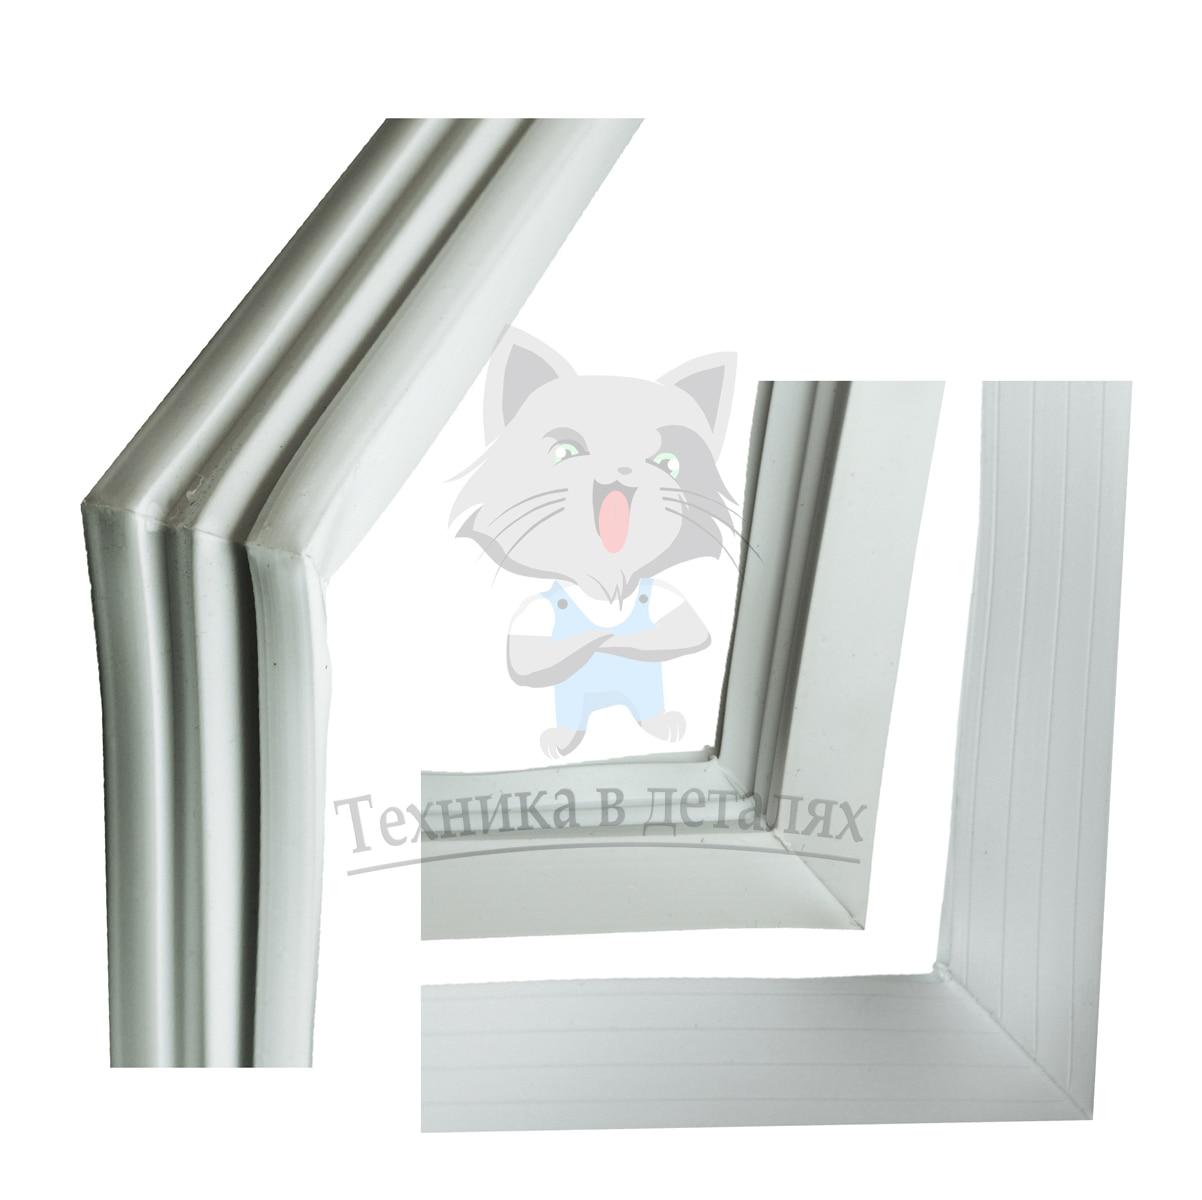 Selo freezer geladeira stinol, indesit, ariston, hotpoint-ariston tamanho 5757 57, código 854013